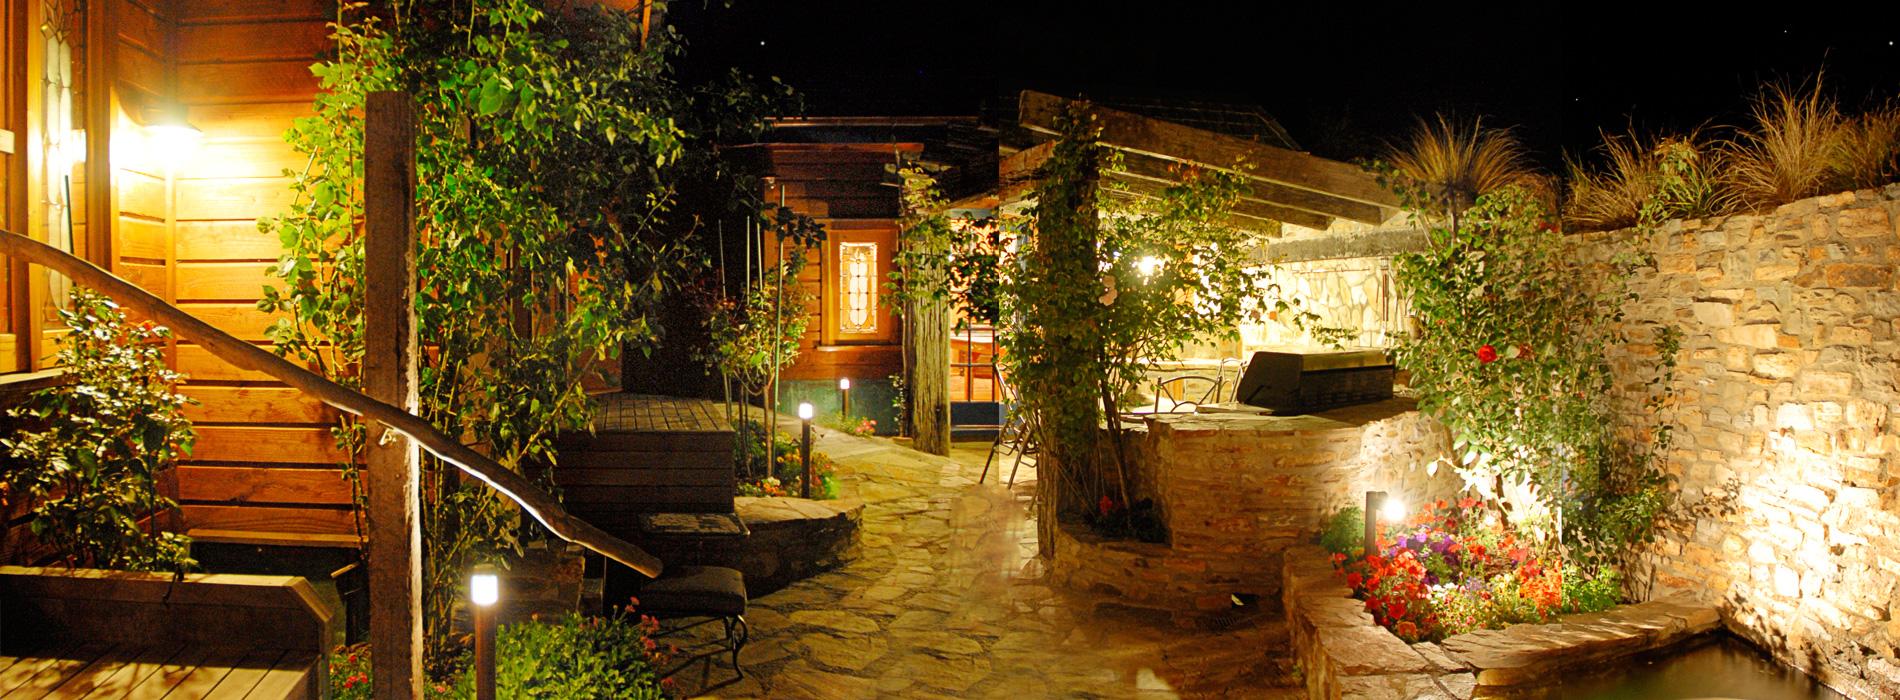 Lumipro focos para jardin iluminaci n de exterior - Iluminacion de exteriores y jardines ...